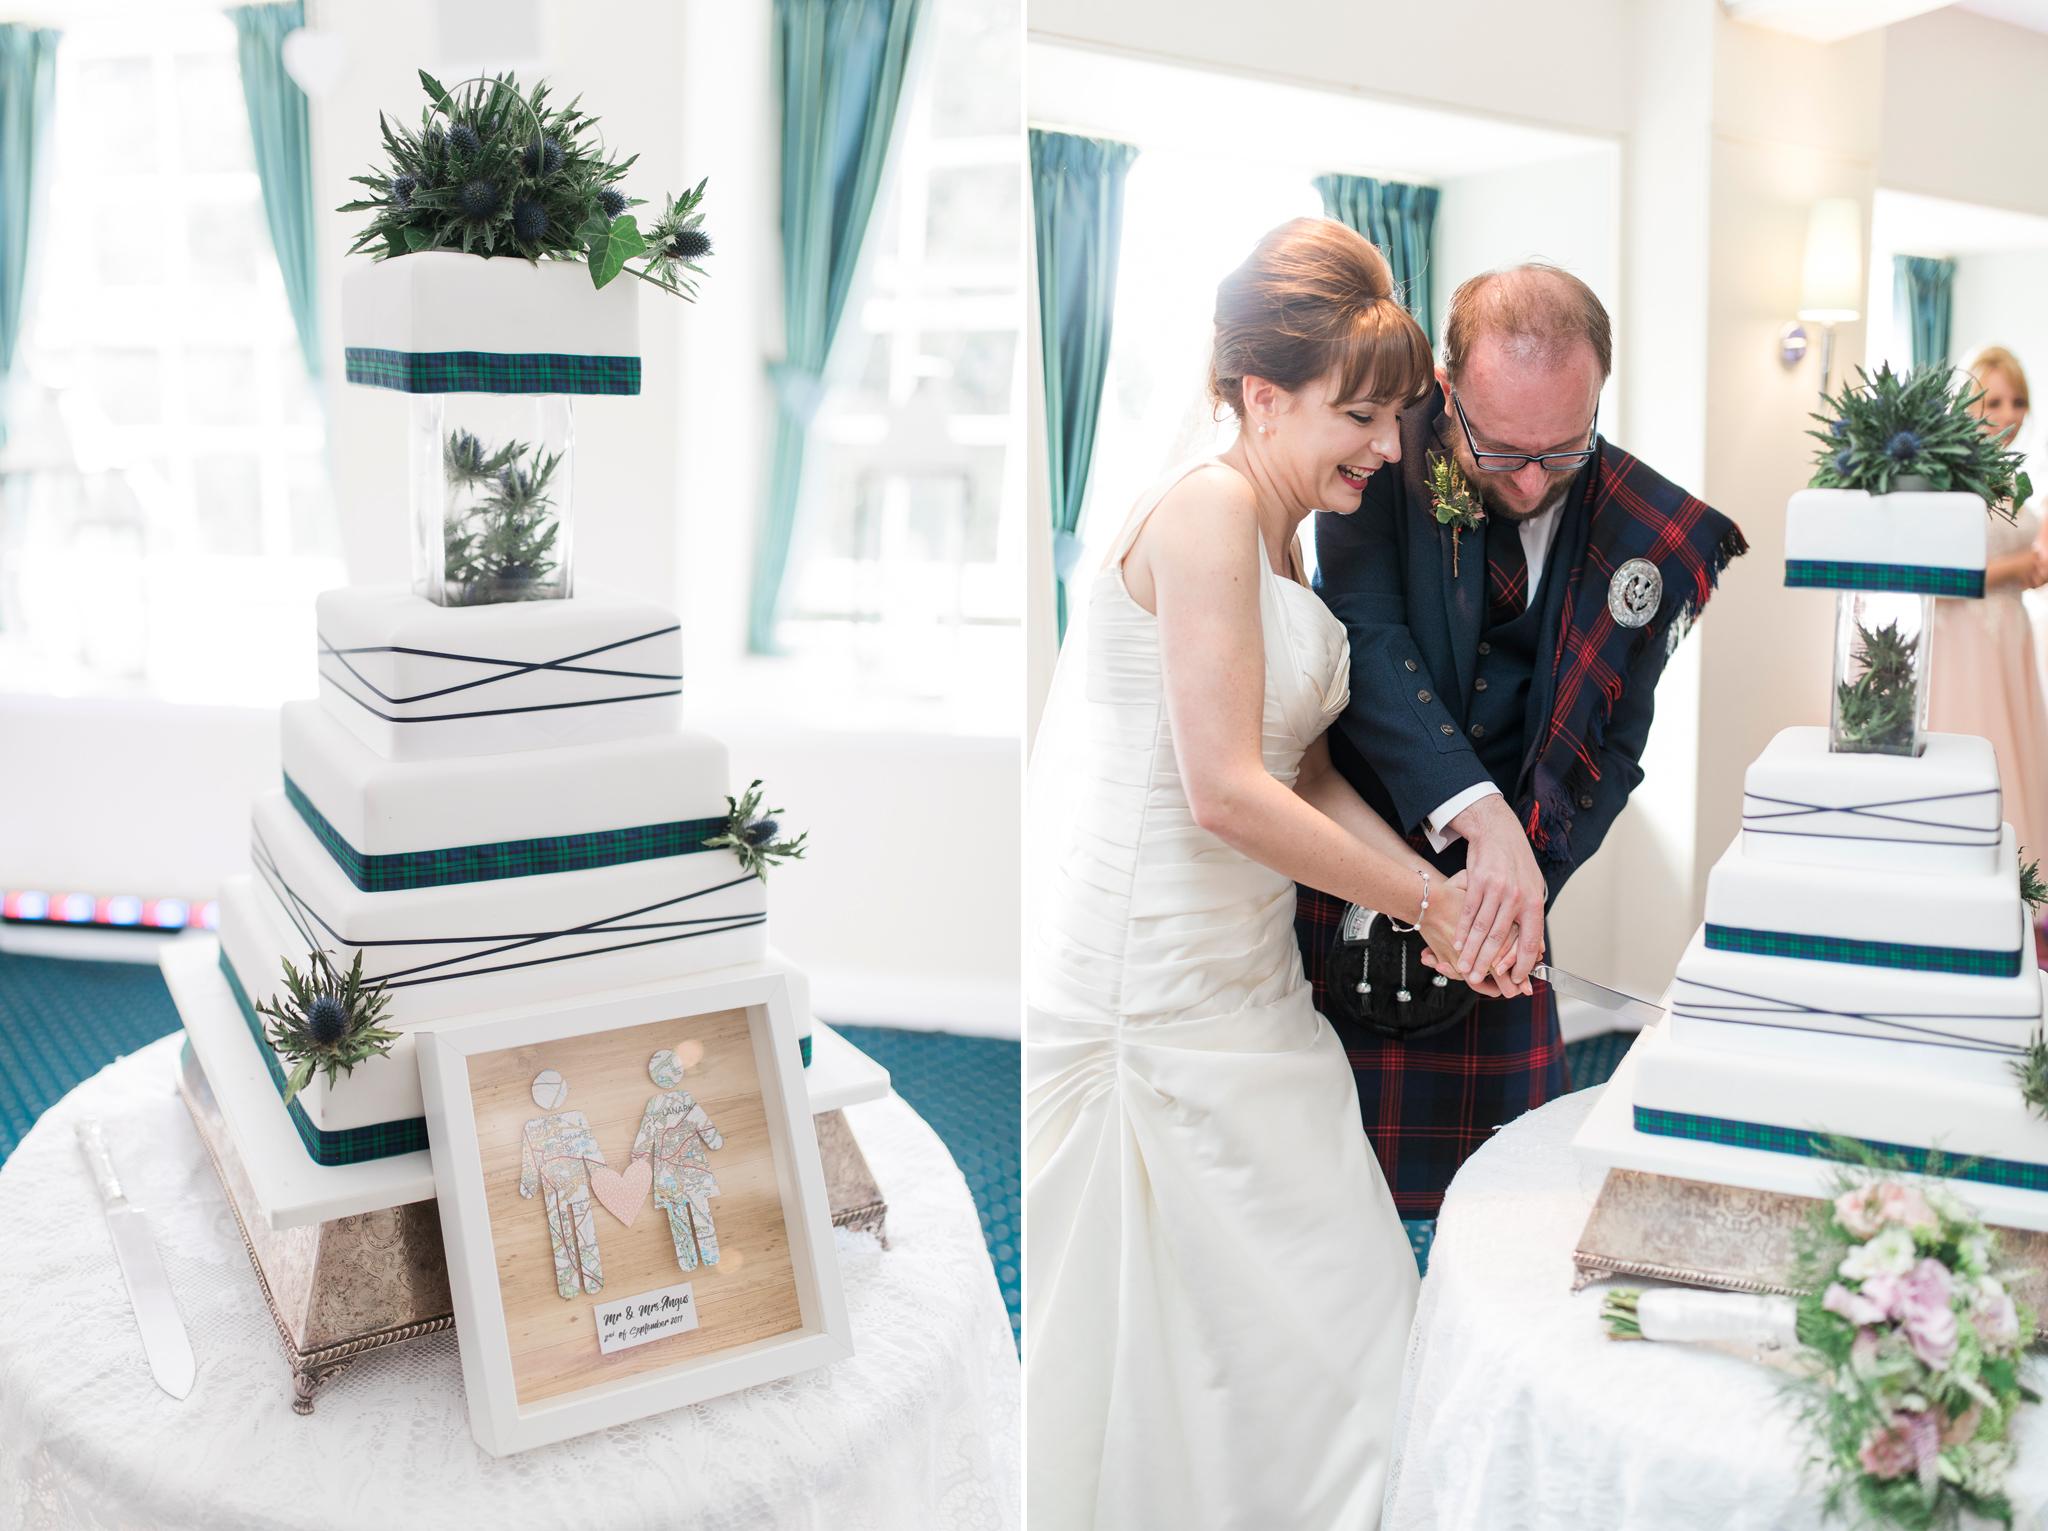 087-scottish-wedding-photographer.jpg